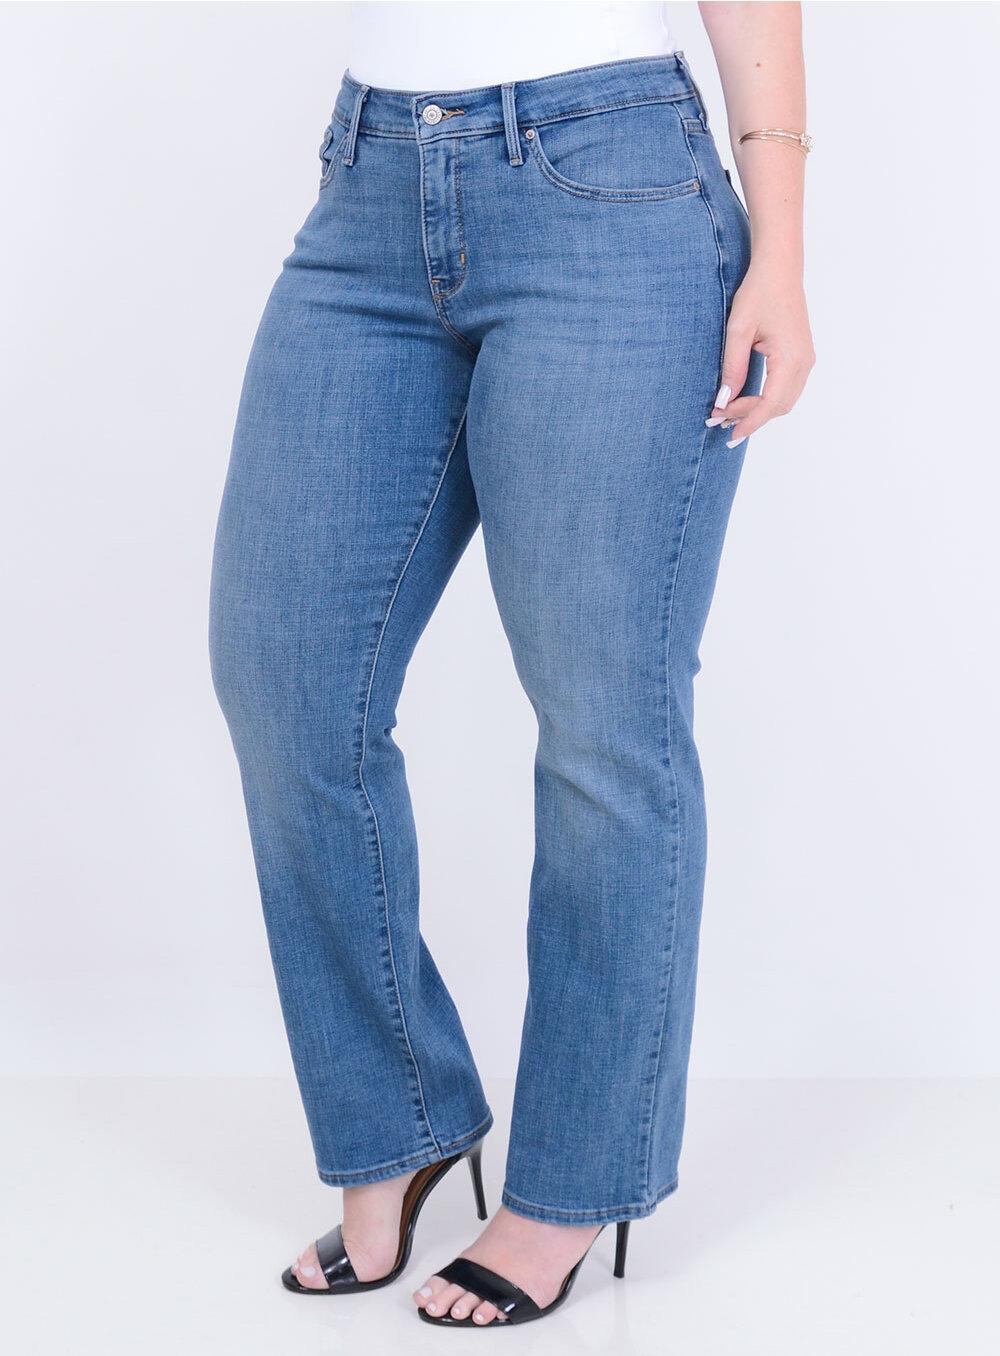 16e018afa Calça Levi s Jeans Feminina 314 Shaping Straight Índigo Best Size - Loja  Virtual de Moda Plus Size